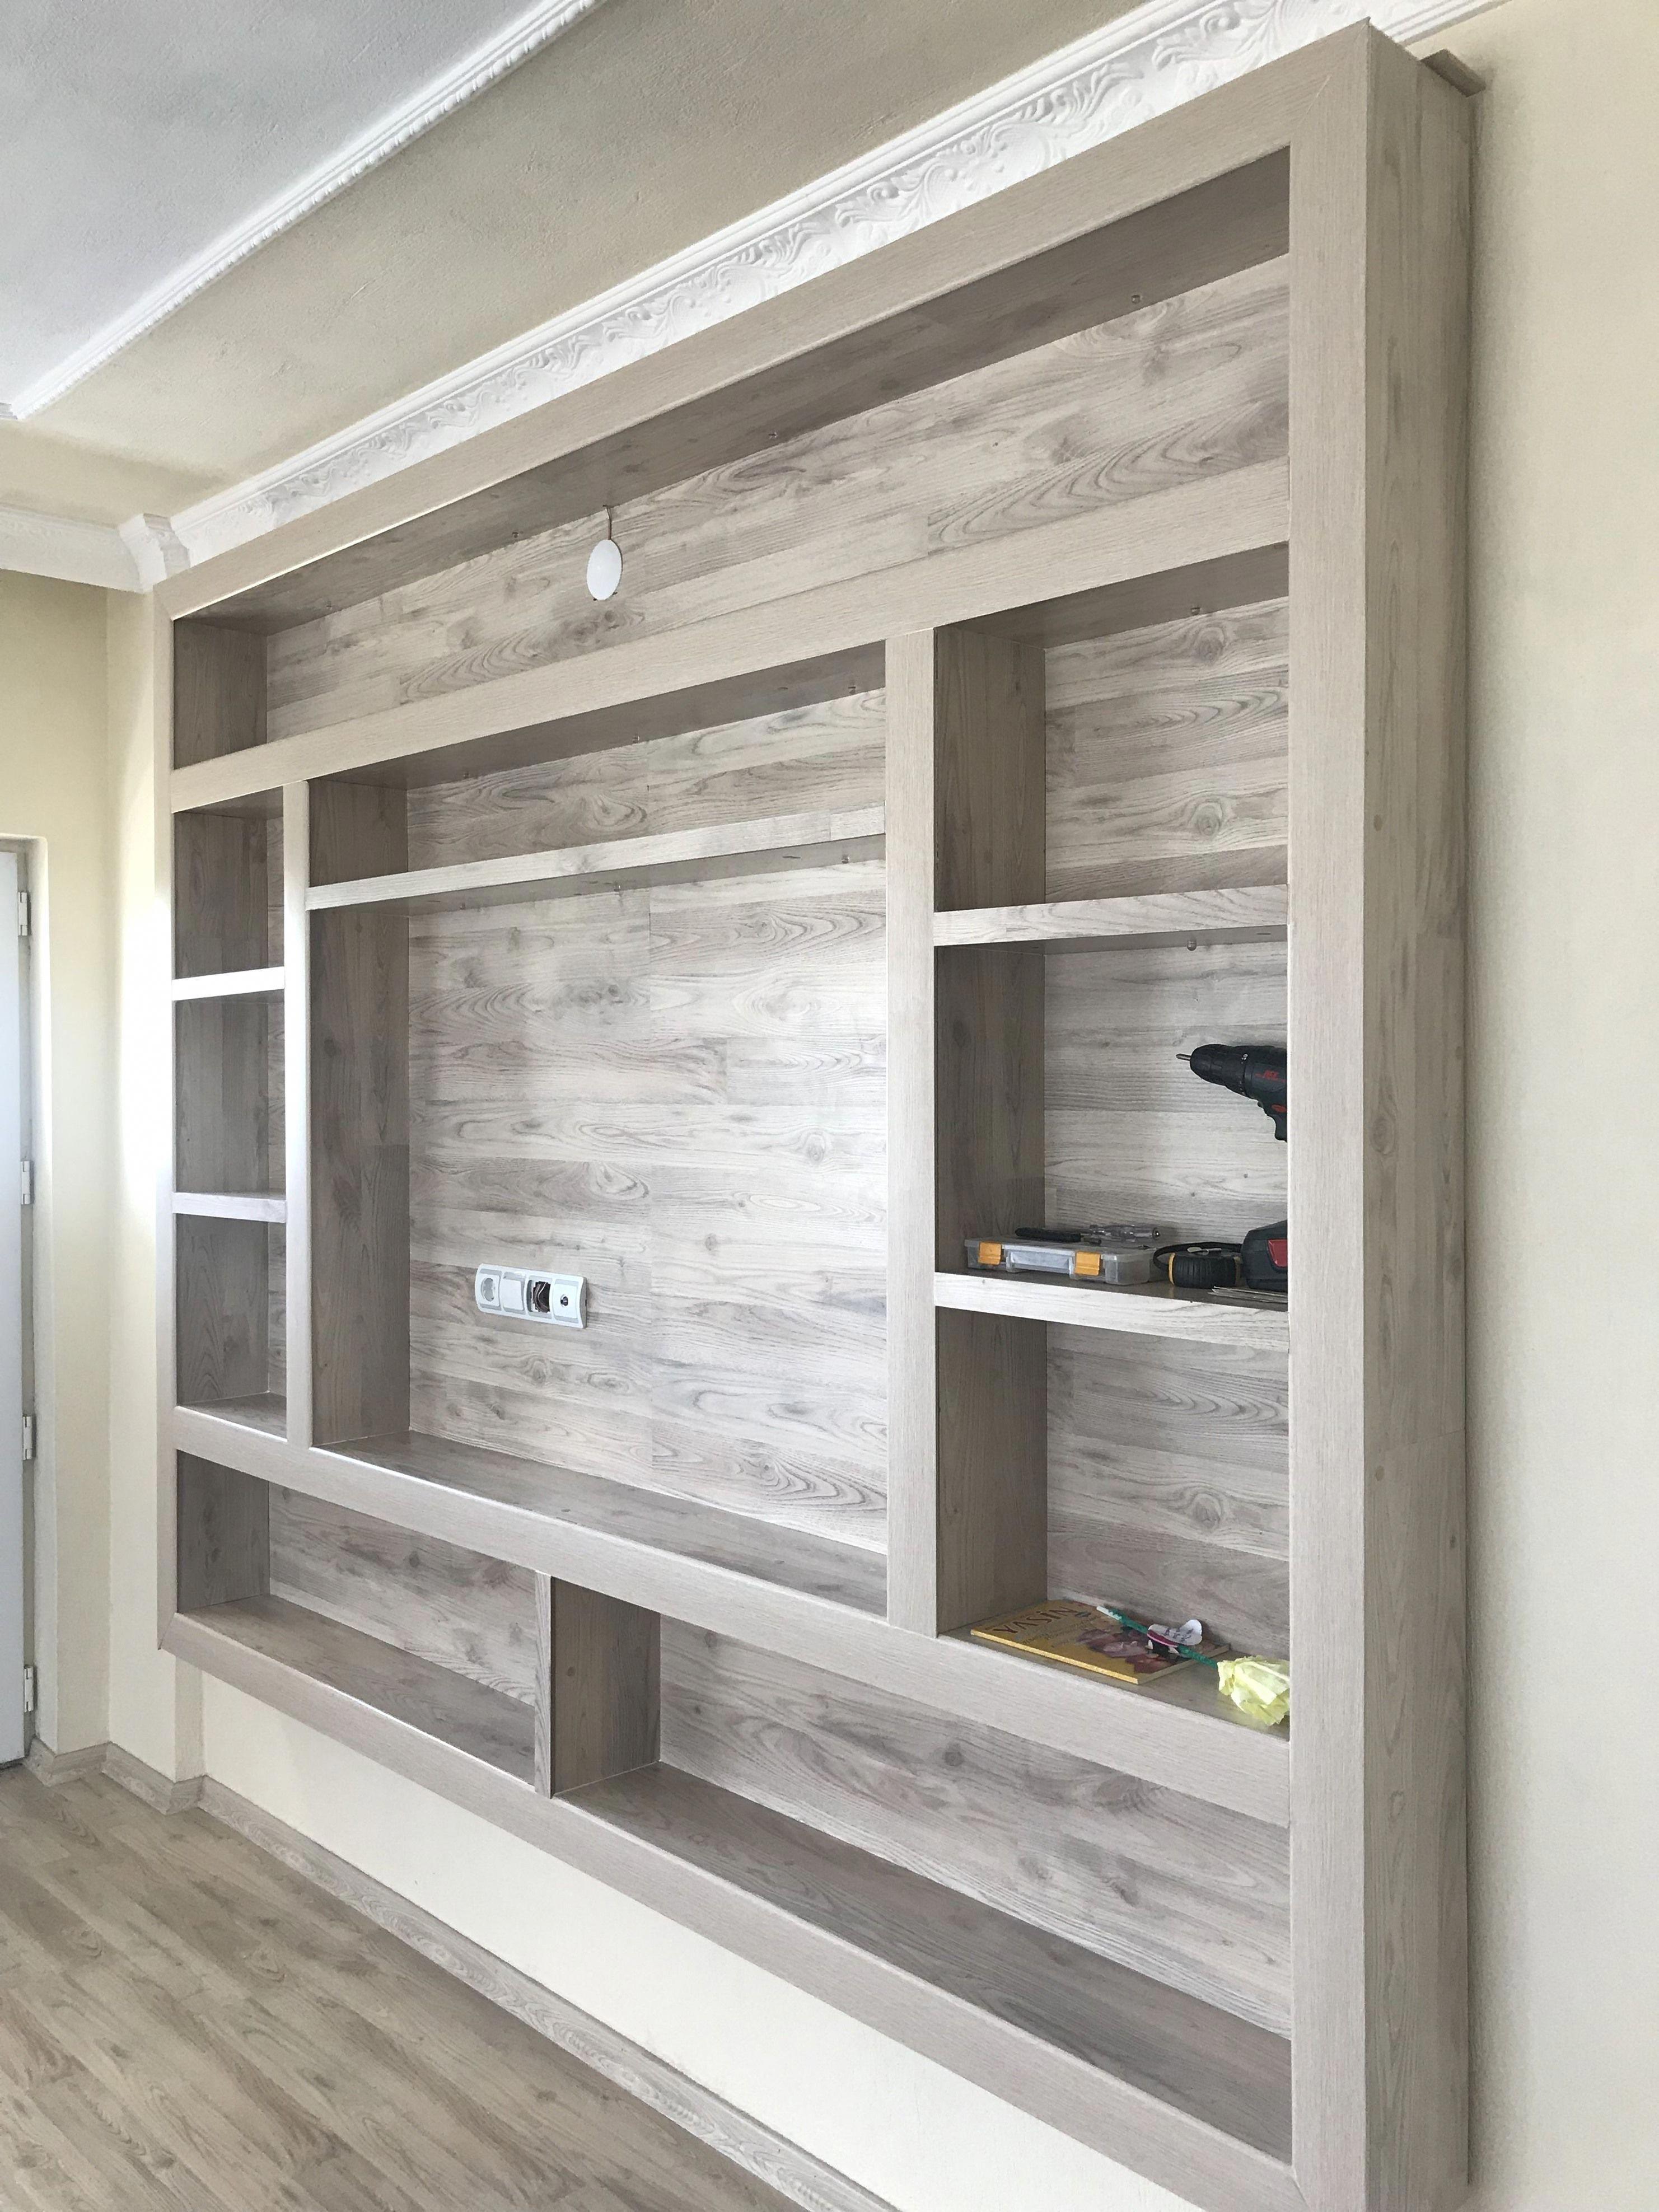 New house renovation ideas basementdecoratingideas also basement rh pinterest